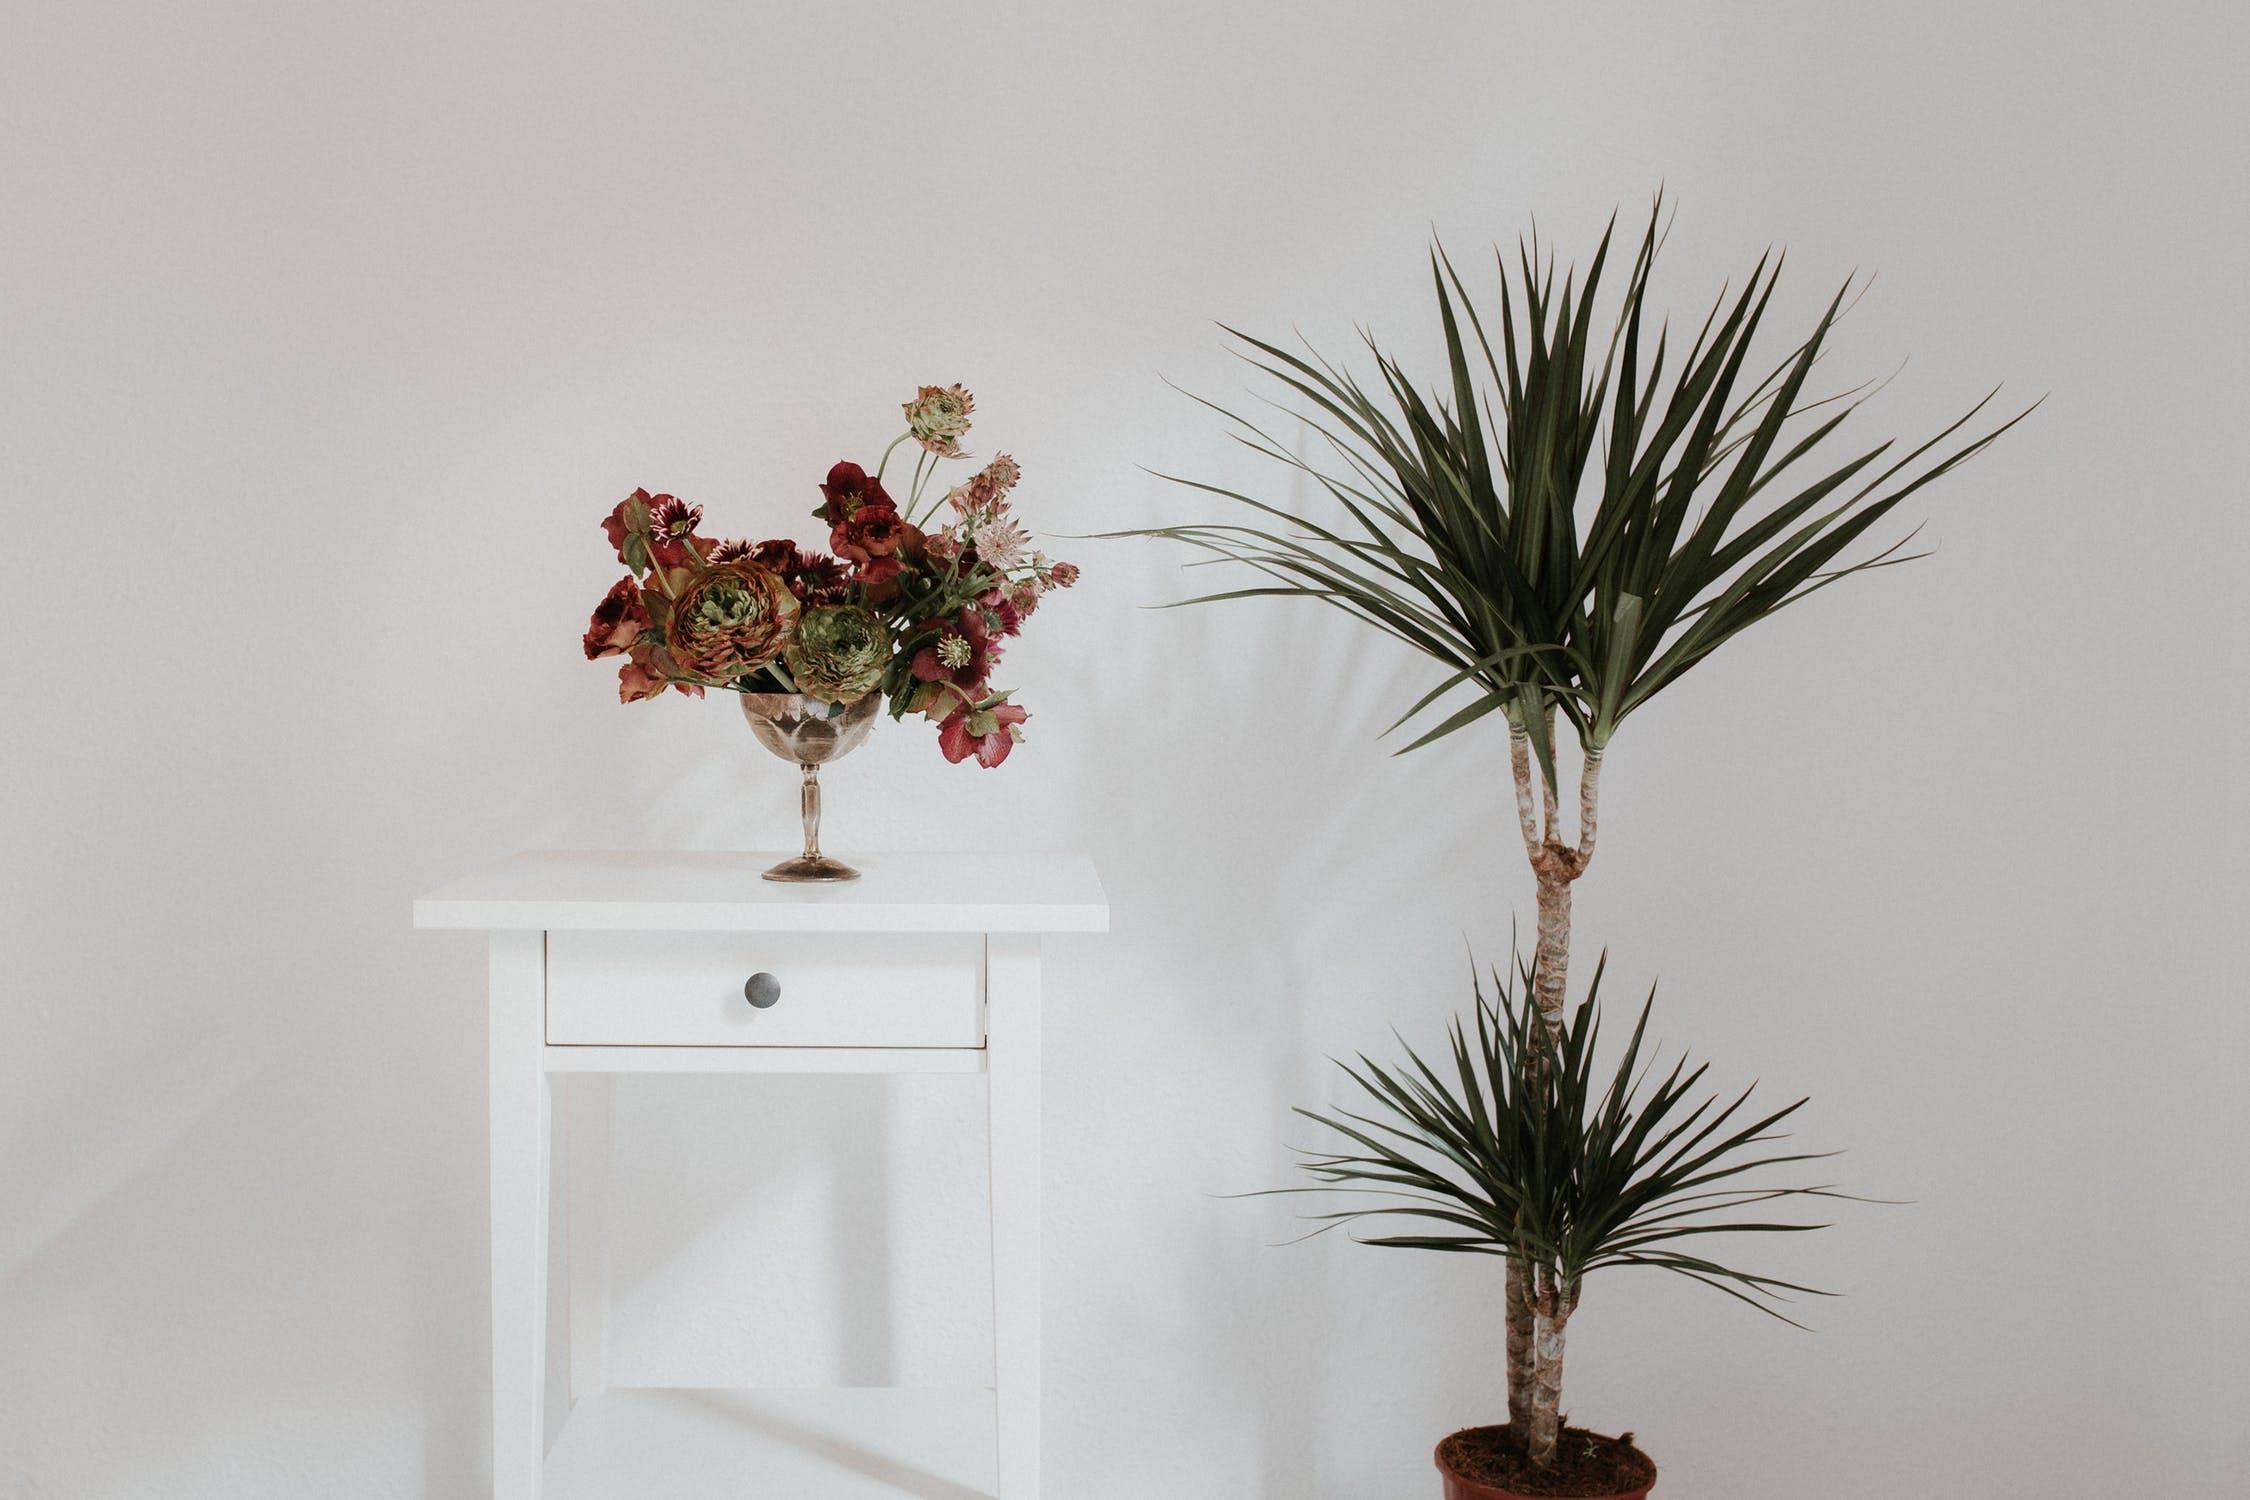 house plants, house plants